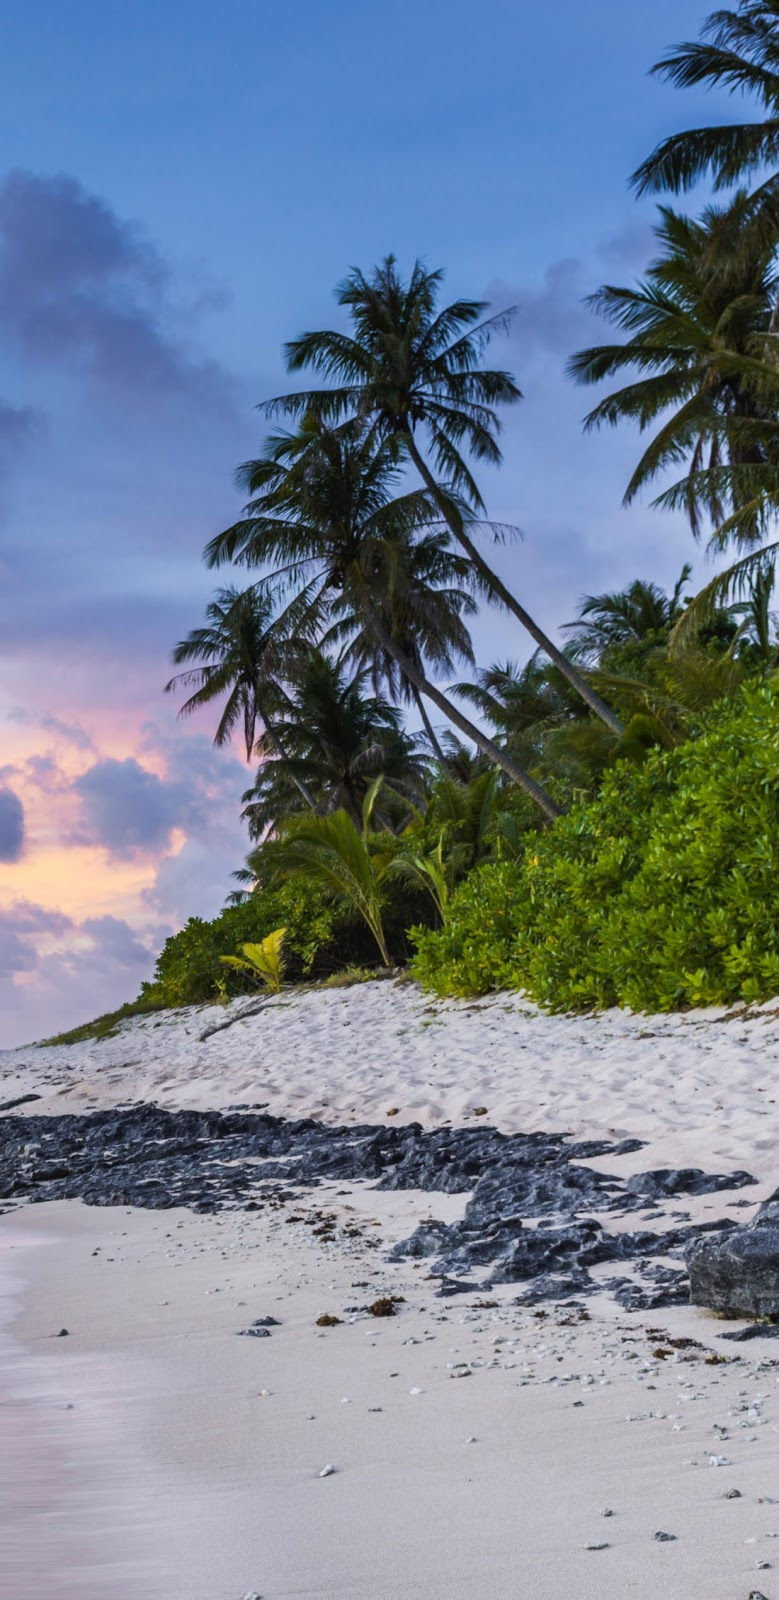 coast-photograph-sea-body_of_water-tropics